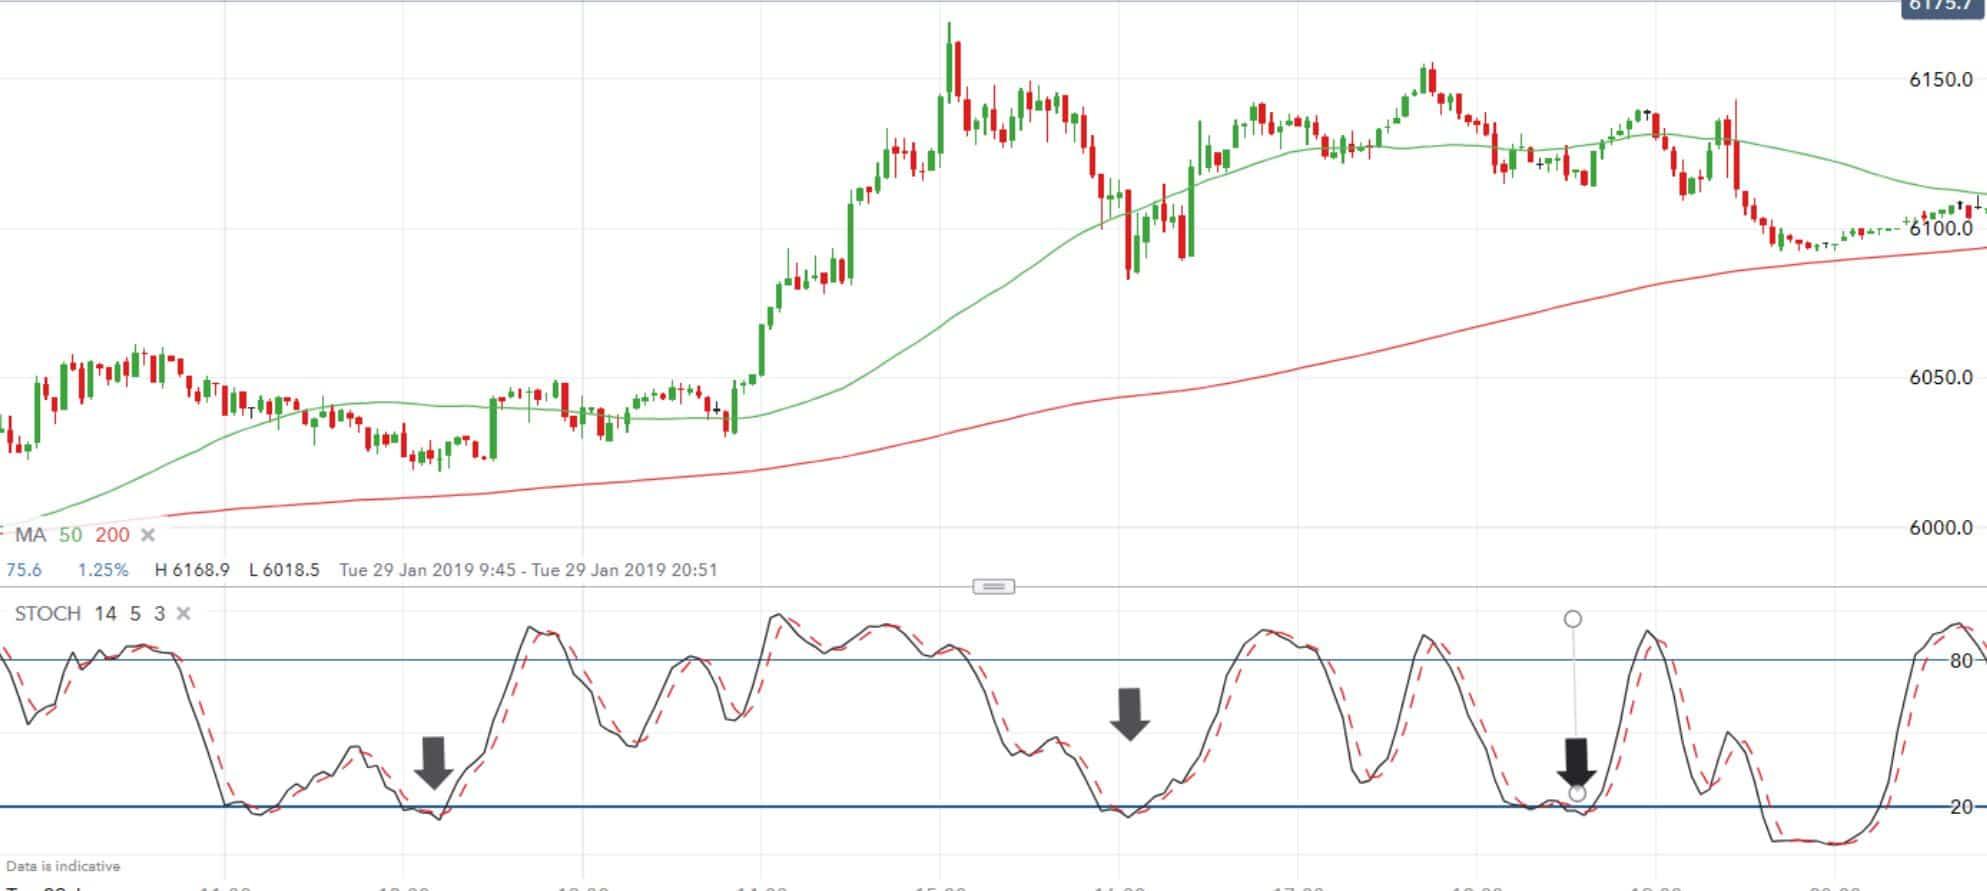 Stochastic oscillator scalping trading strategy